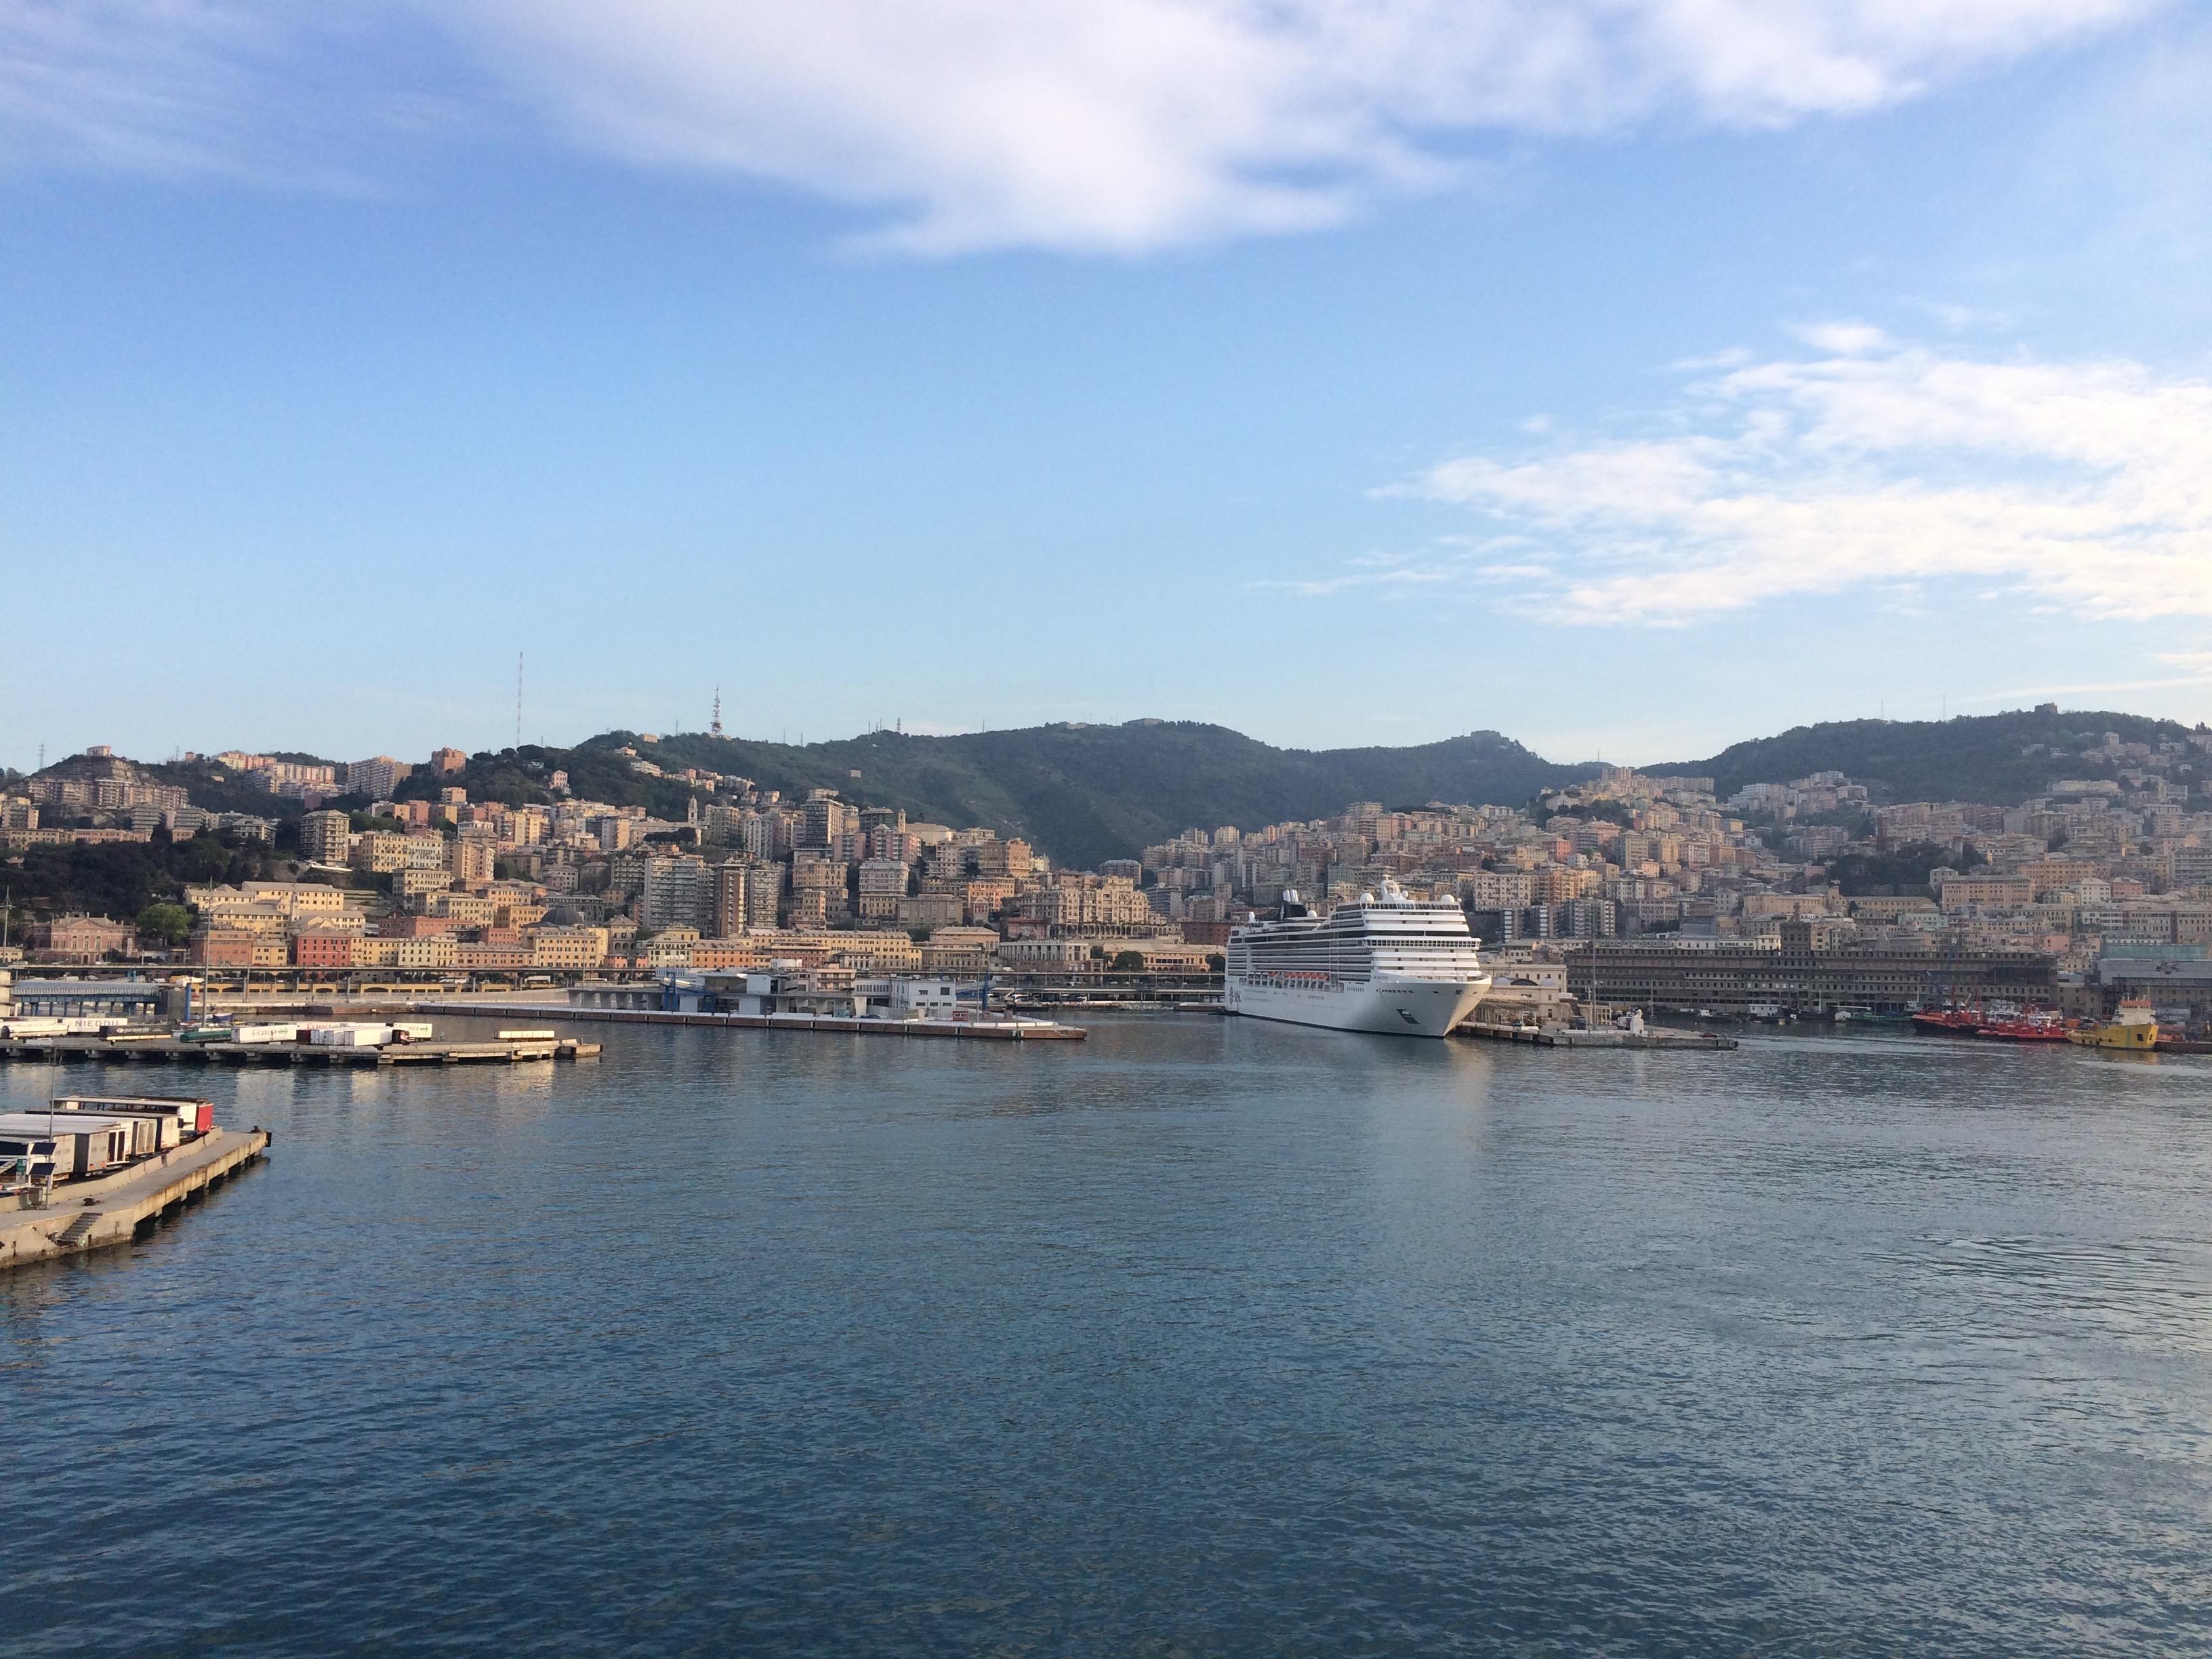 GNV ferry Barcelona to Genoa Arriving in Genoa